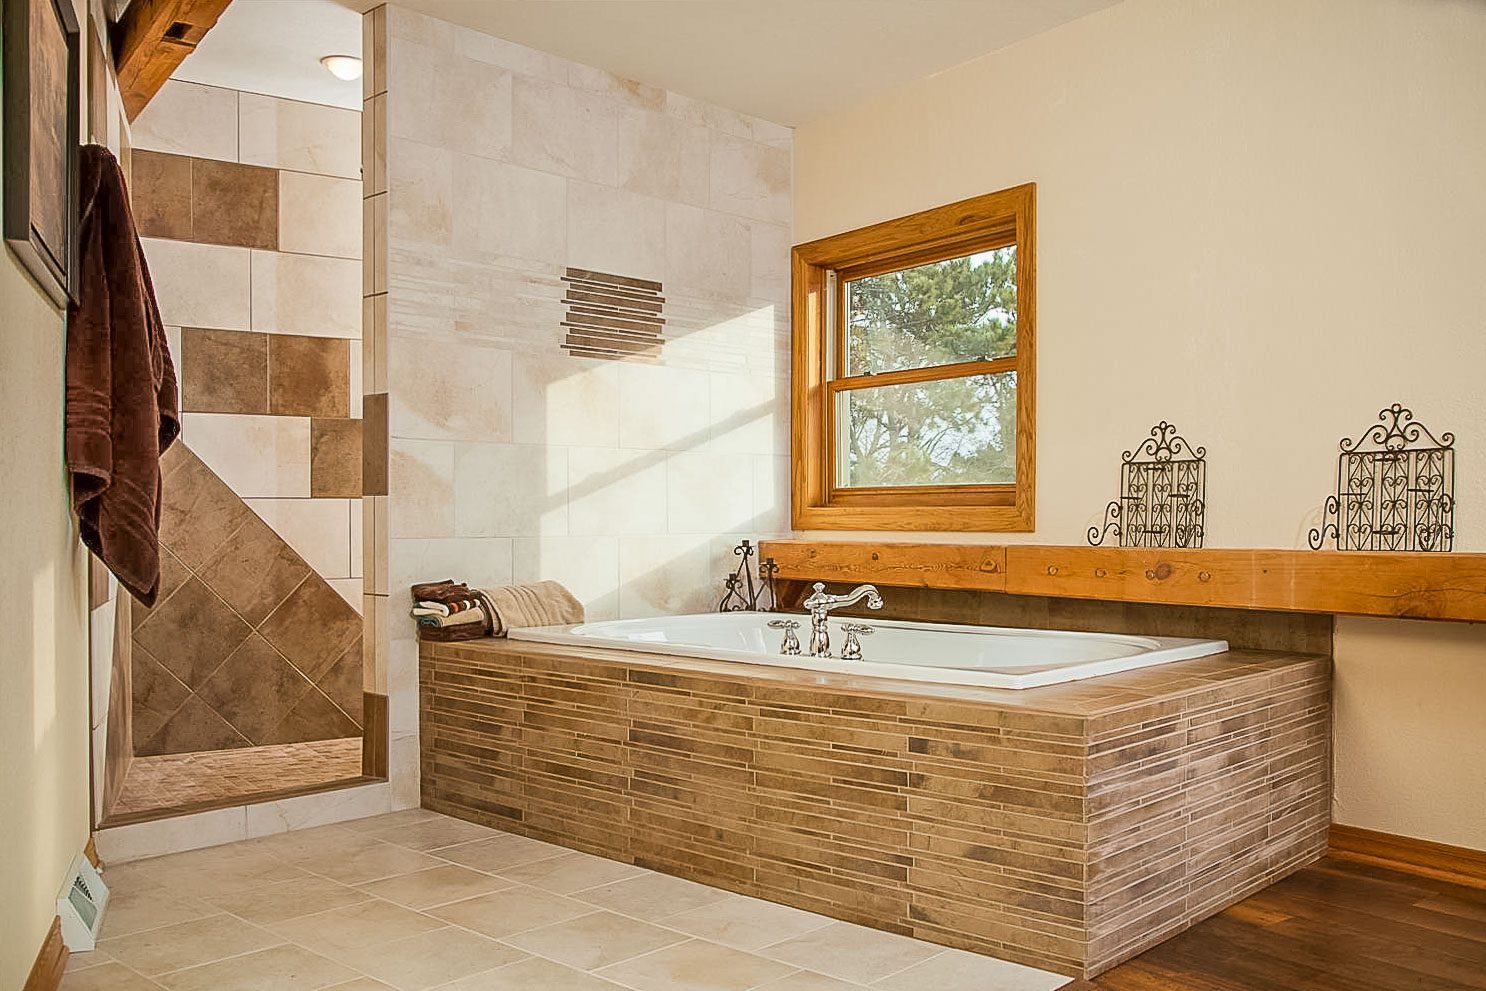 Timber Frame Master Bath